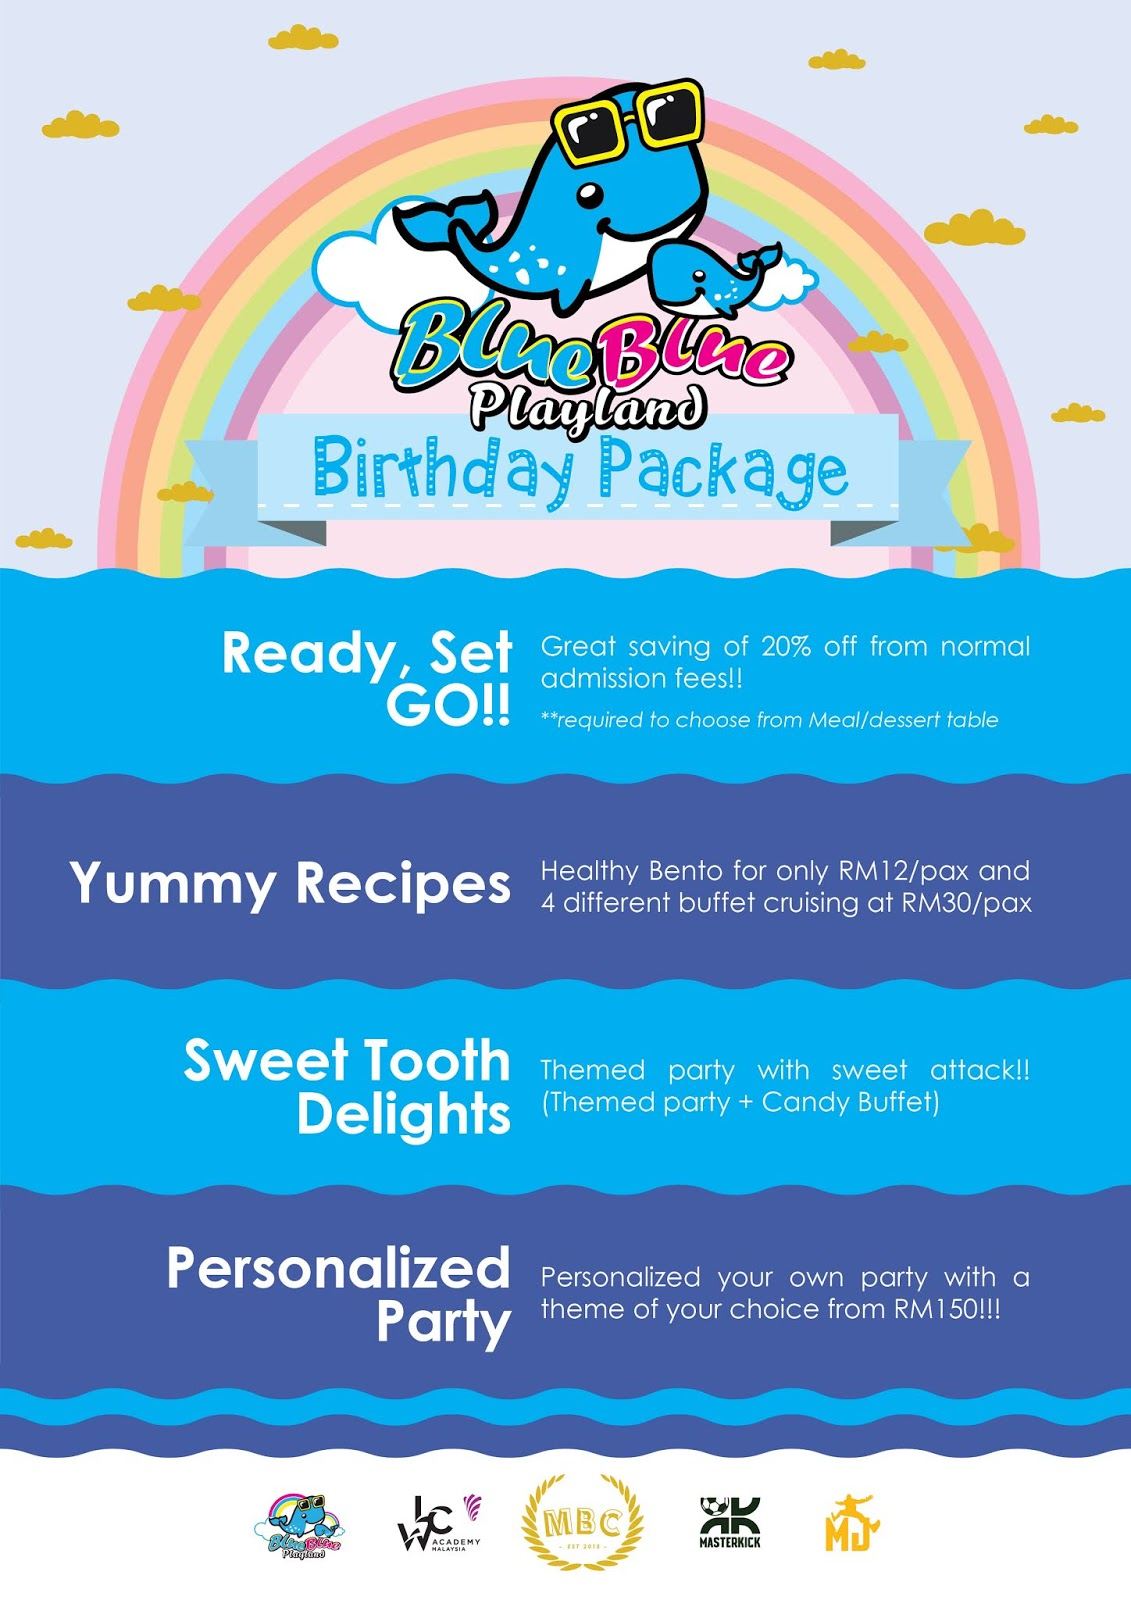 blueblue playland birthday party